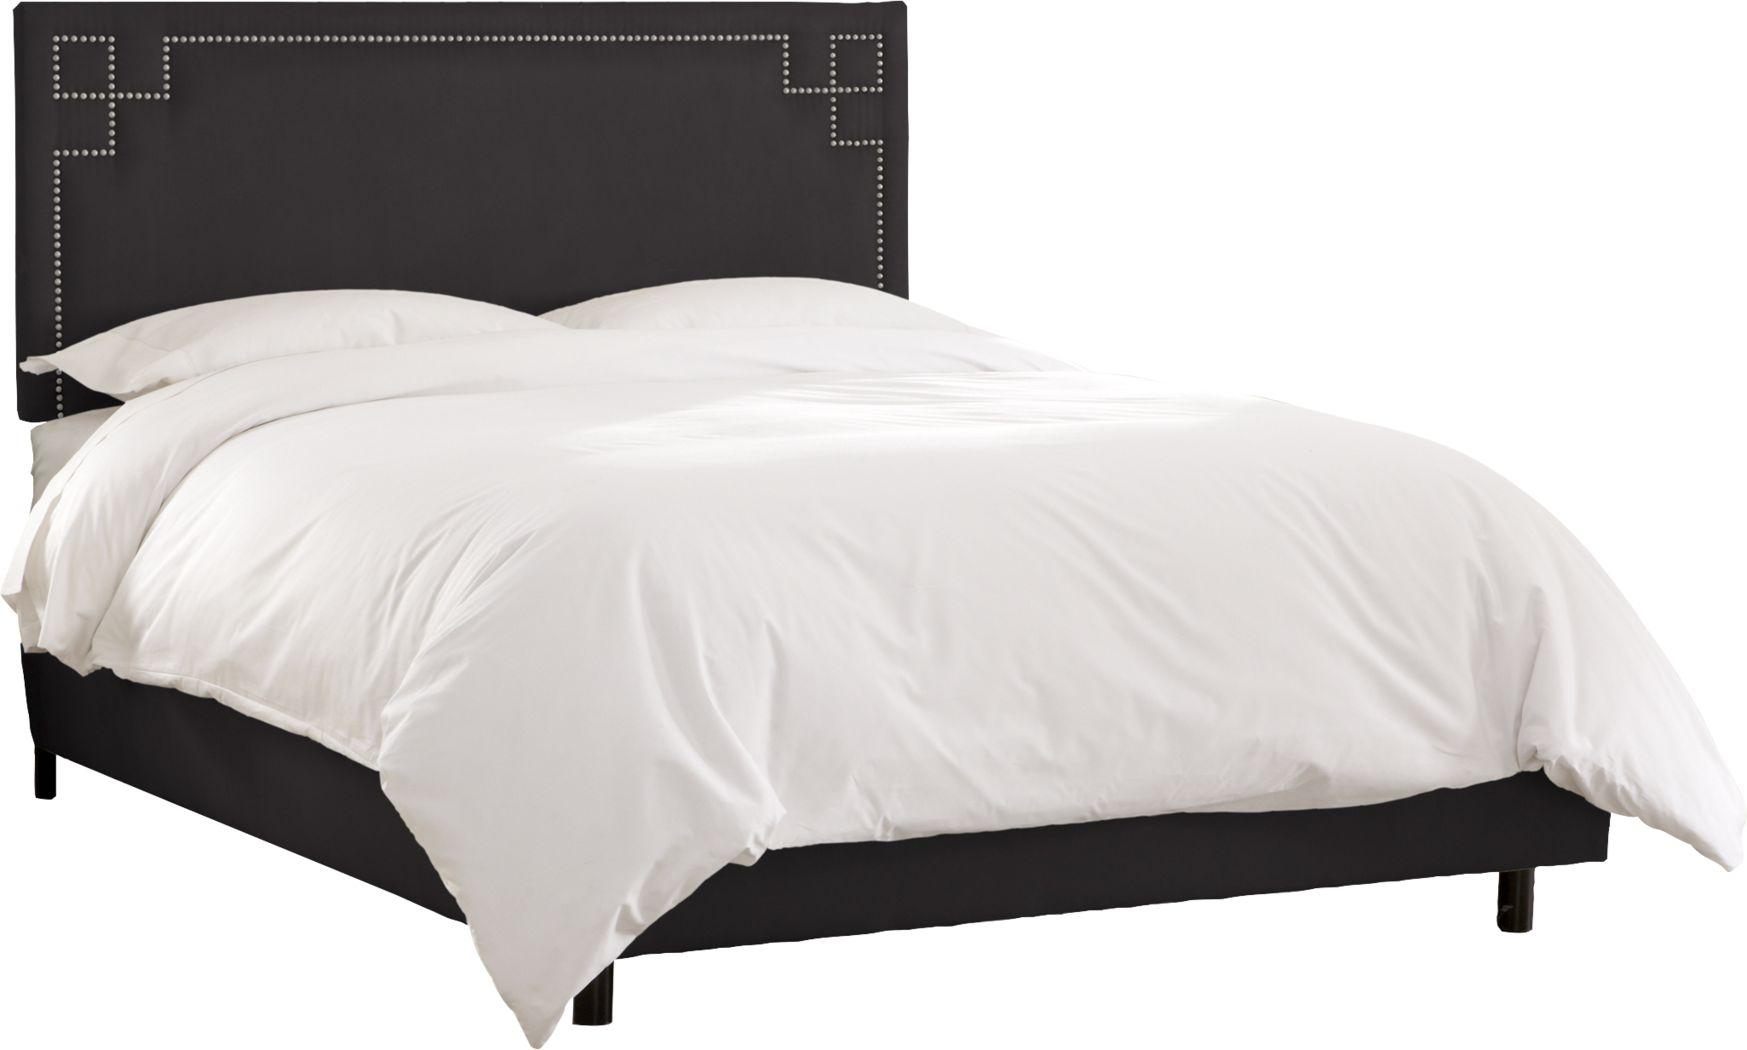 Mendon Bluff Black 3 Pc Queen Bed